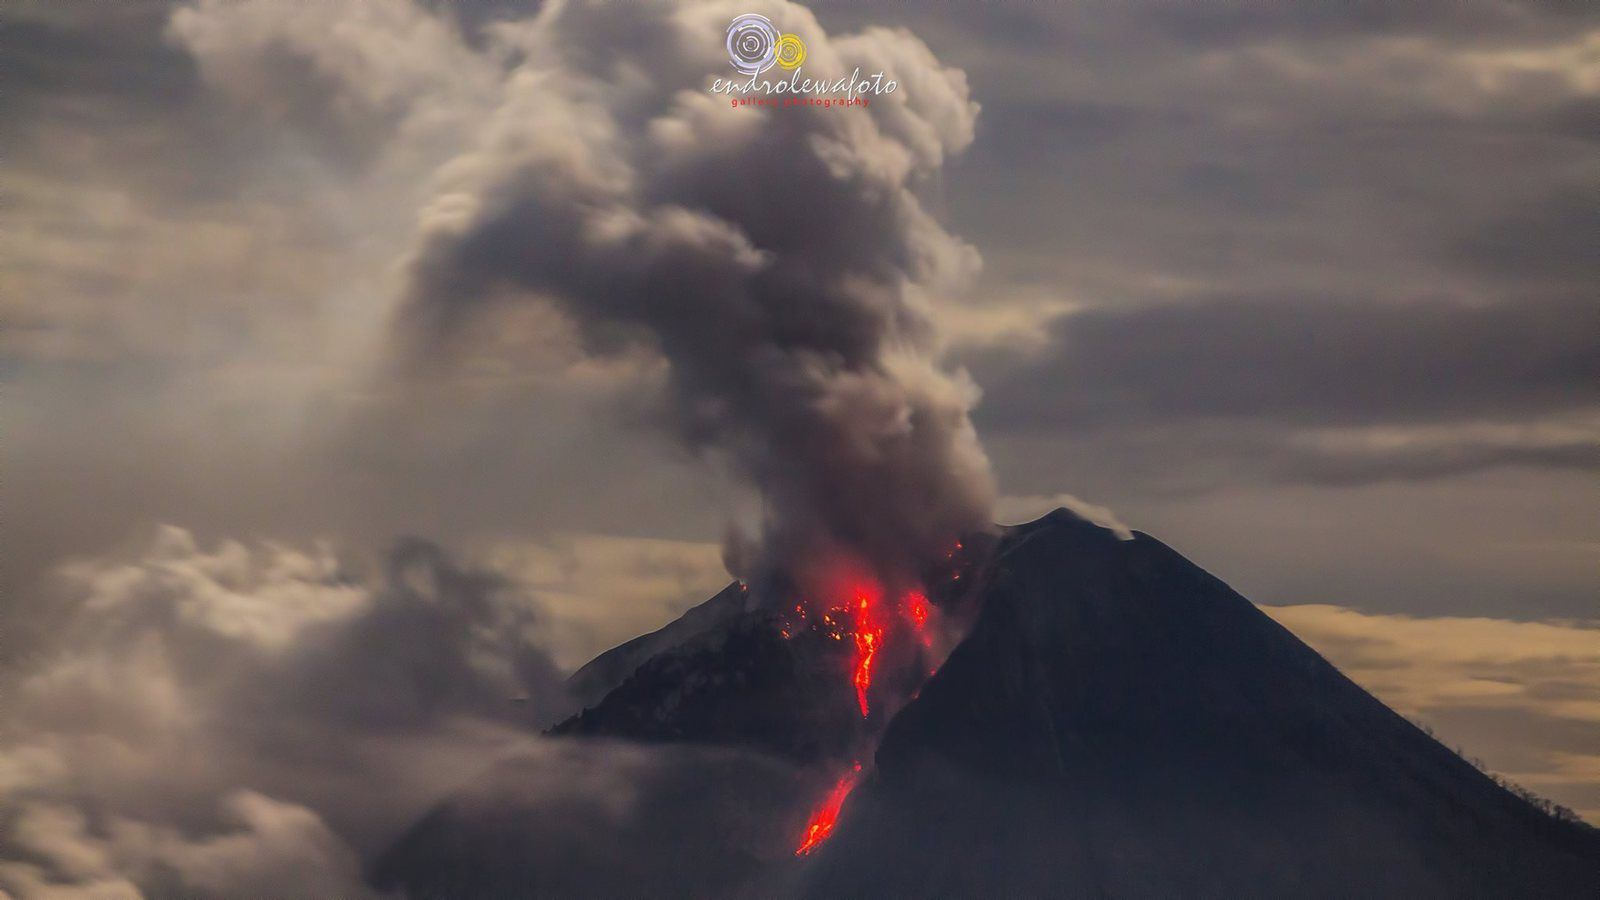 Sinabung - activity this morning 12.11.2016 / respectively at 0h58 and 2h28 - photos Endro Lewa